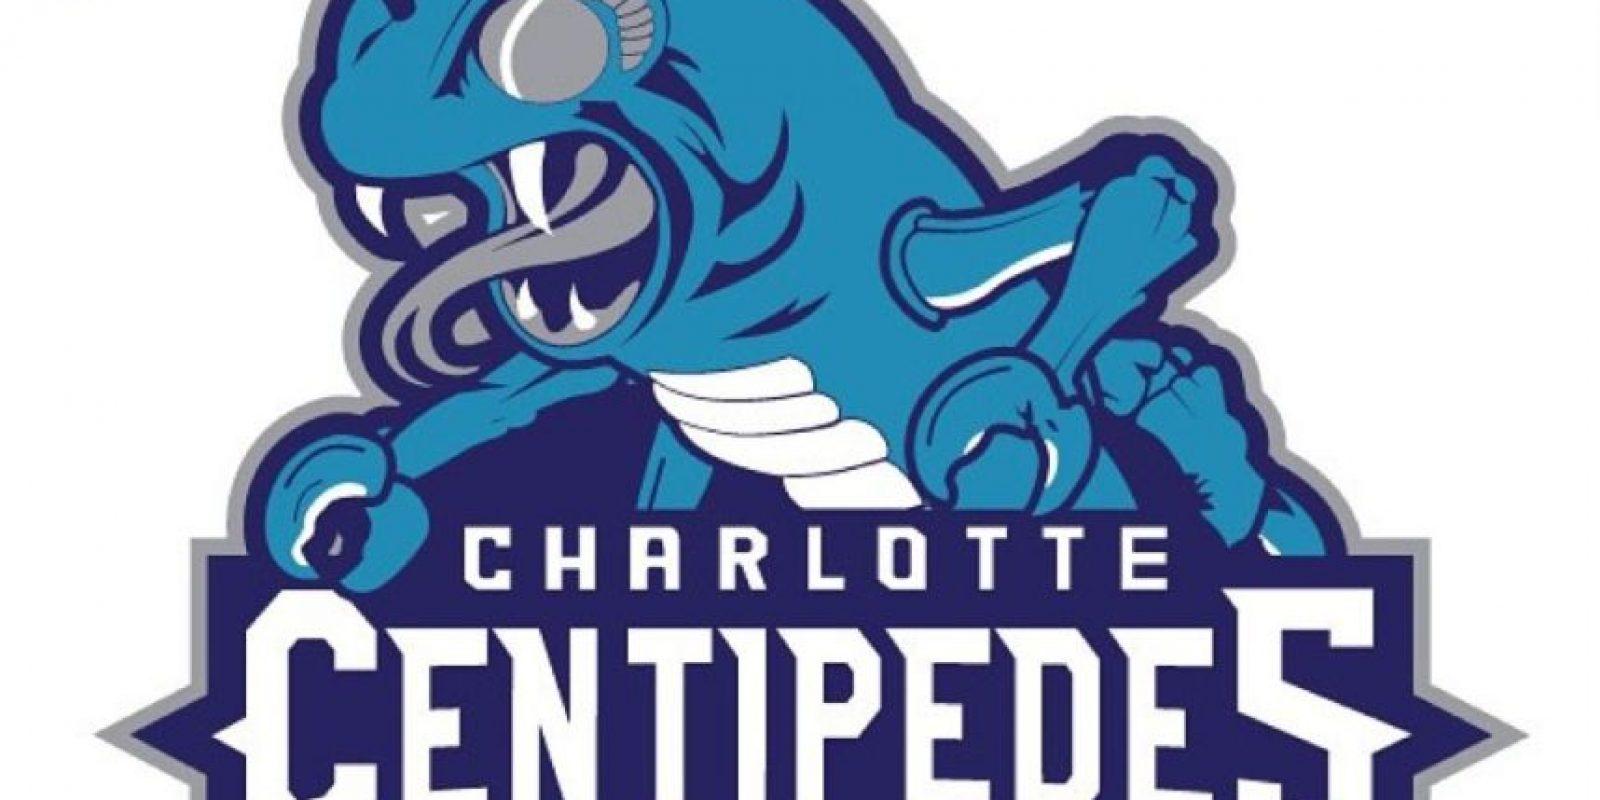 """Centipede"" en el logo de Charlotte Hornets. Foto:instagram.com/ak47_studios"